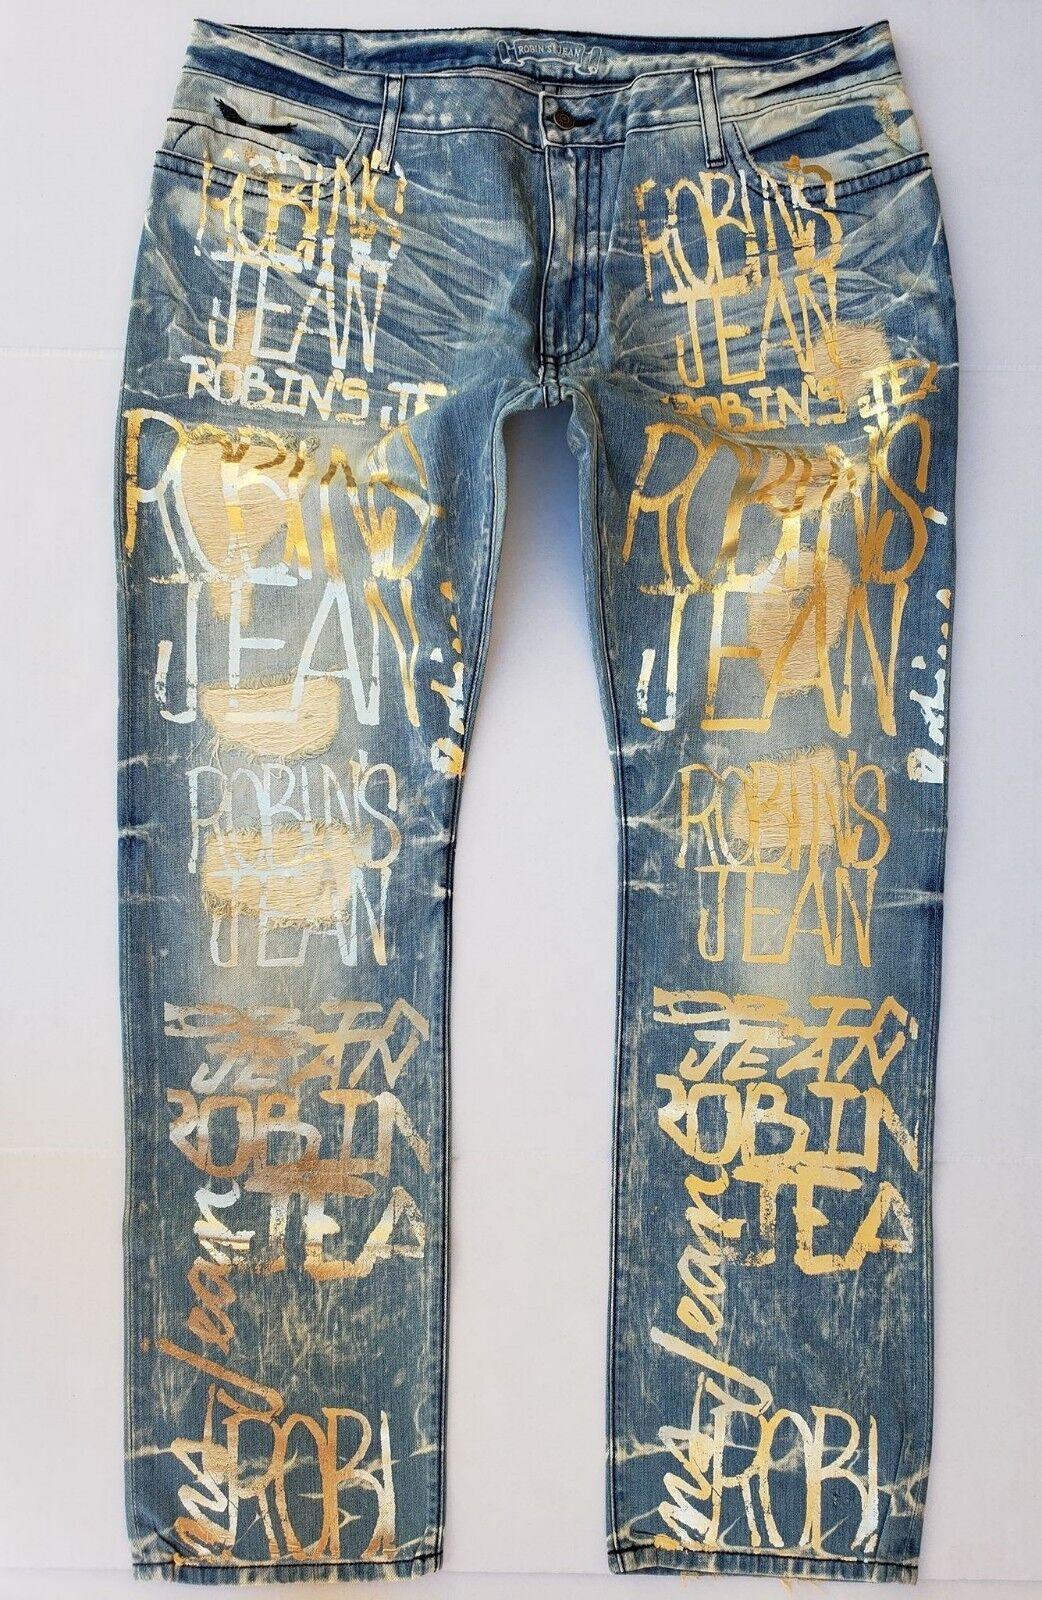 Neu Herren ROTKEHLCHEN Jeans Größe 42 Eng Gerade Antik Jeans -Gold Graffiti